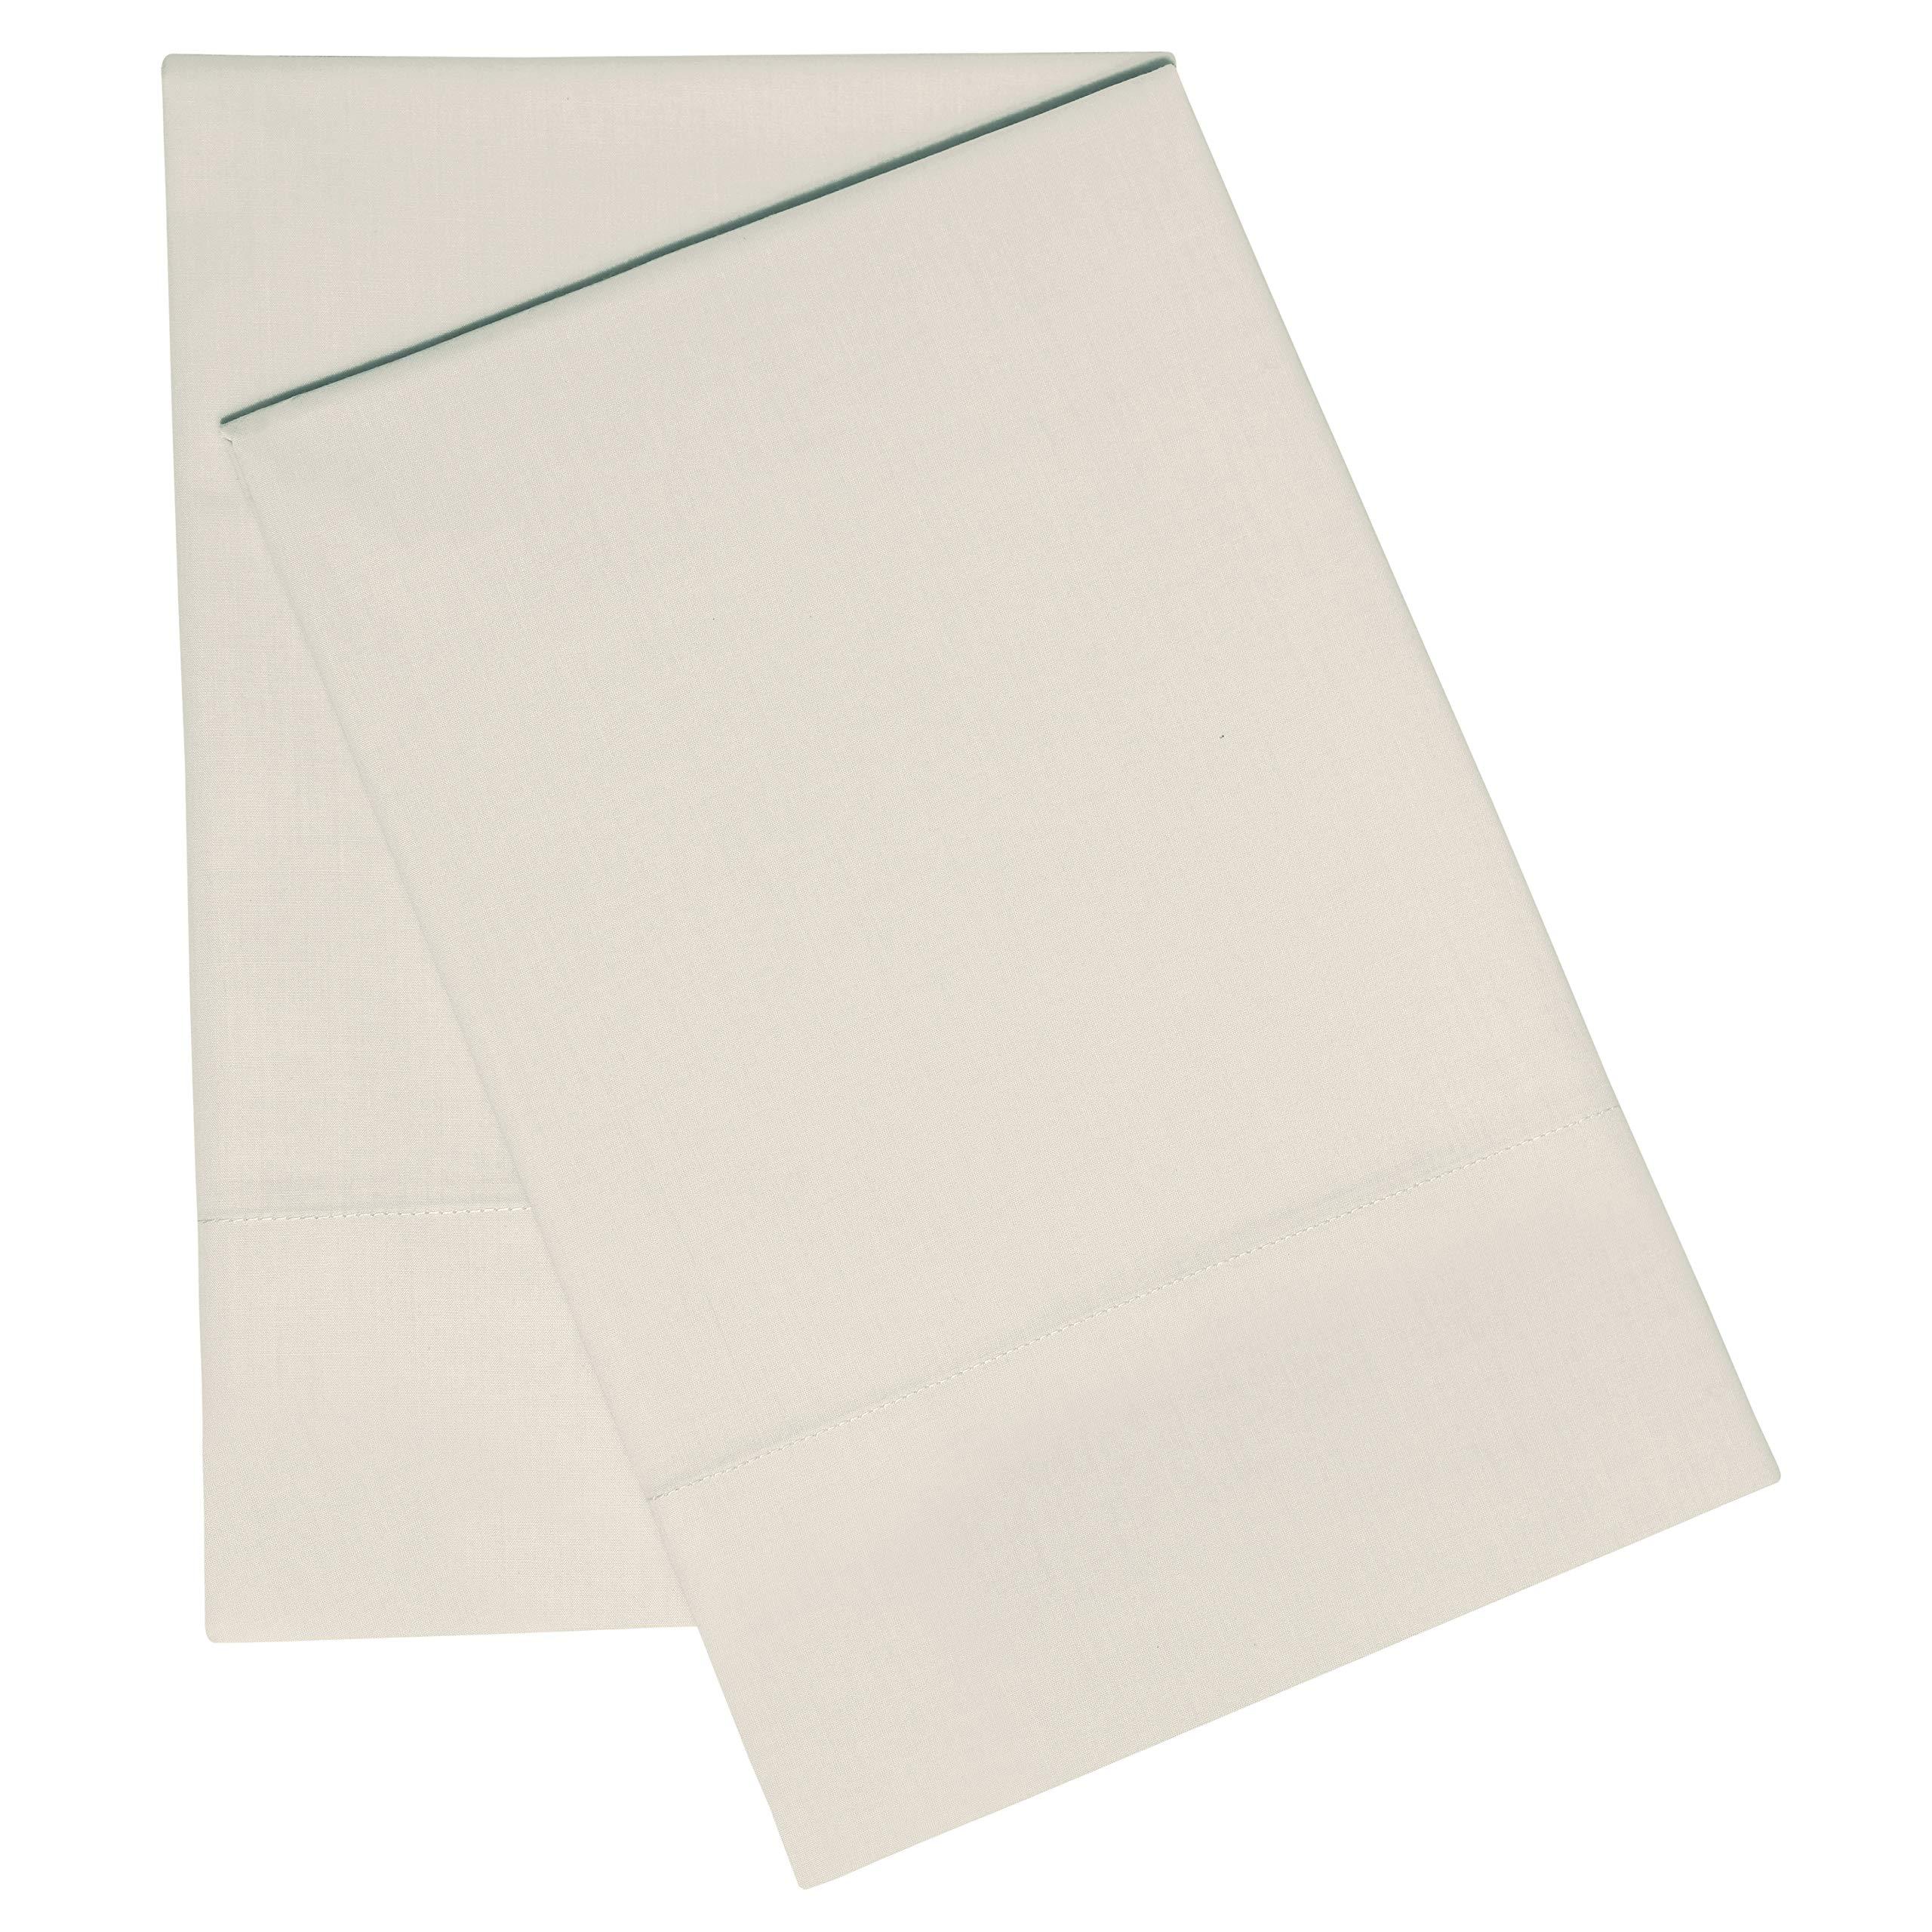 EnvioHome GOTS Certified 300 Thread Count 100% Organic Cotton Pillowcase Pair - Natural, King